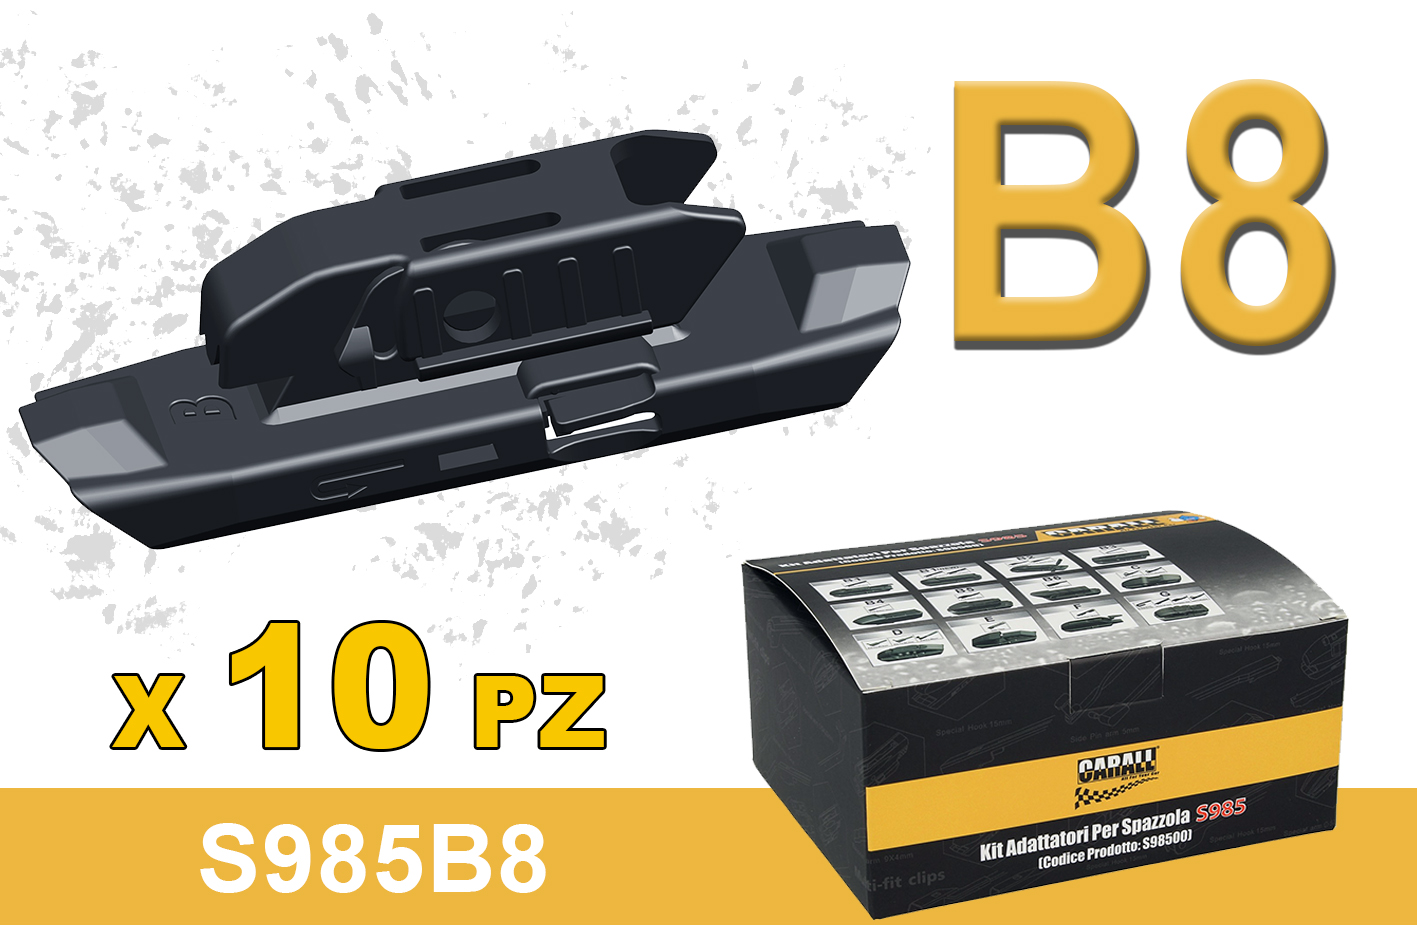 Kit 10 Attacchi B8 Per Spazzole Tergicristallo Carall S985 Flat e T191 Ibrida Dacia Dokker Lodgy Duster - KIT